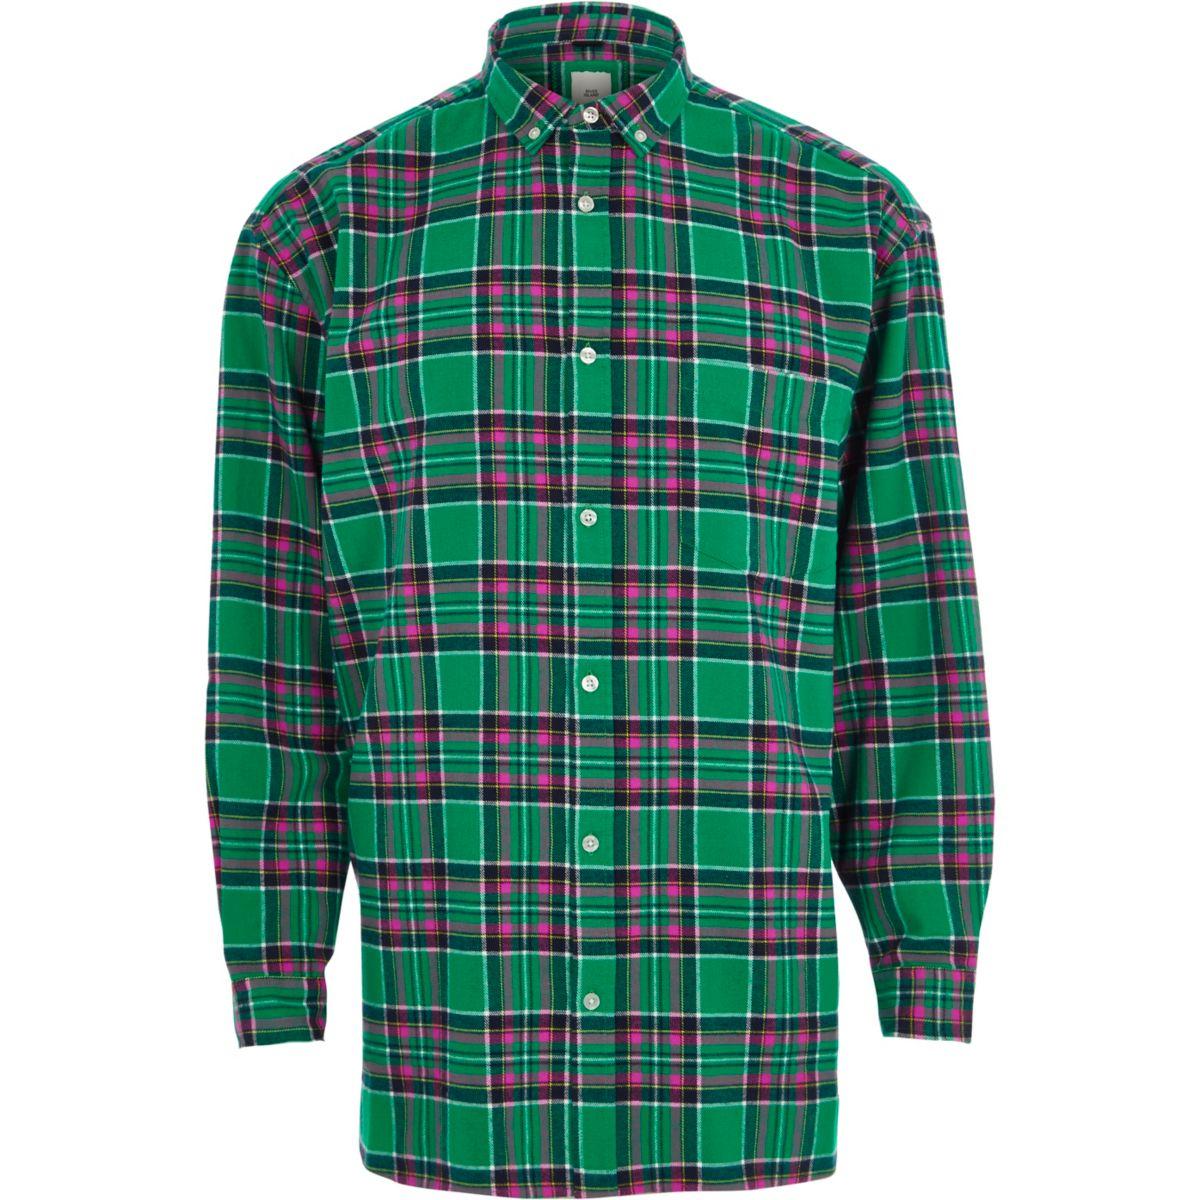 Green check long sleeve oversized shirt